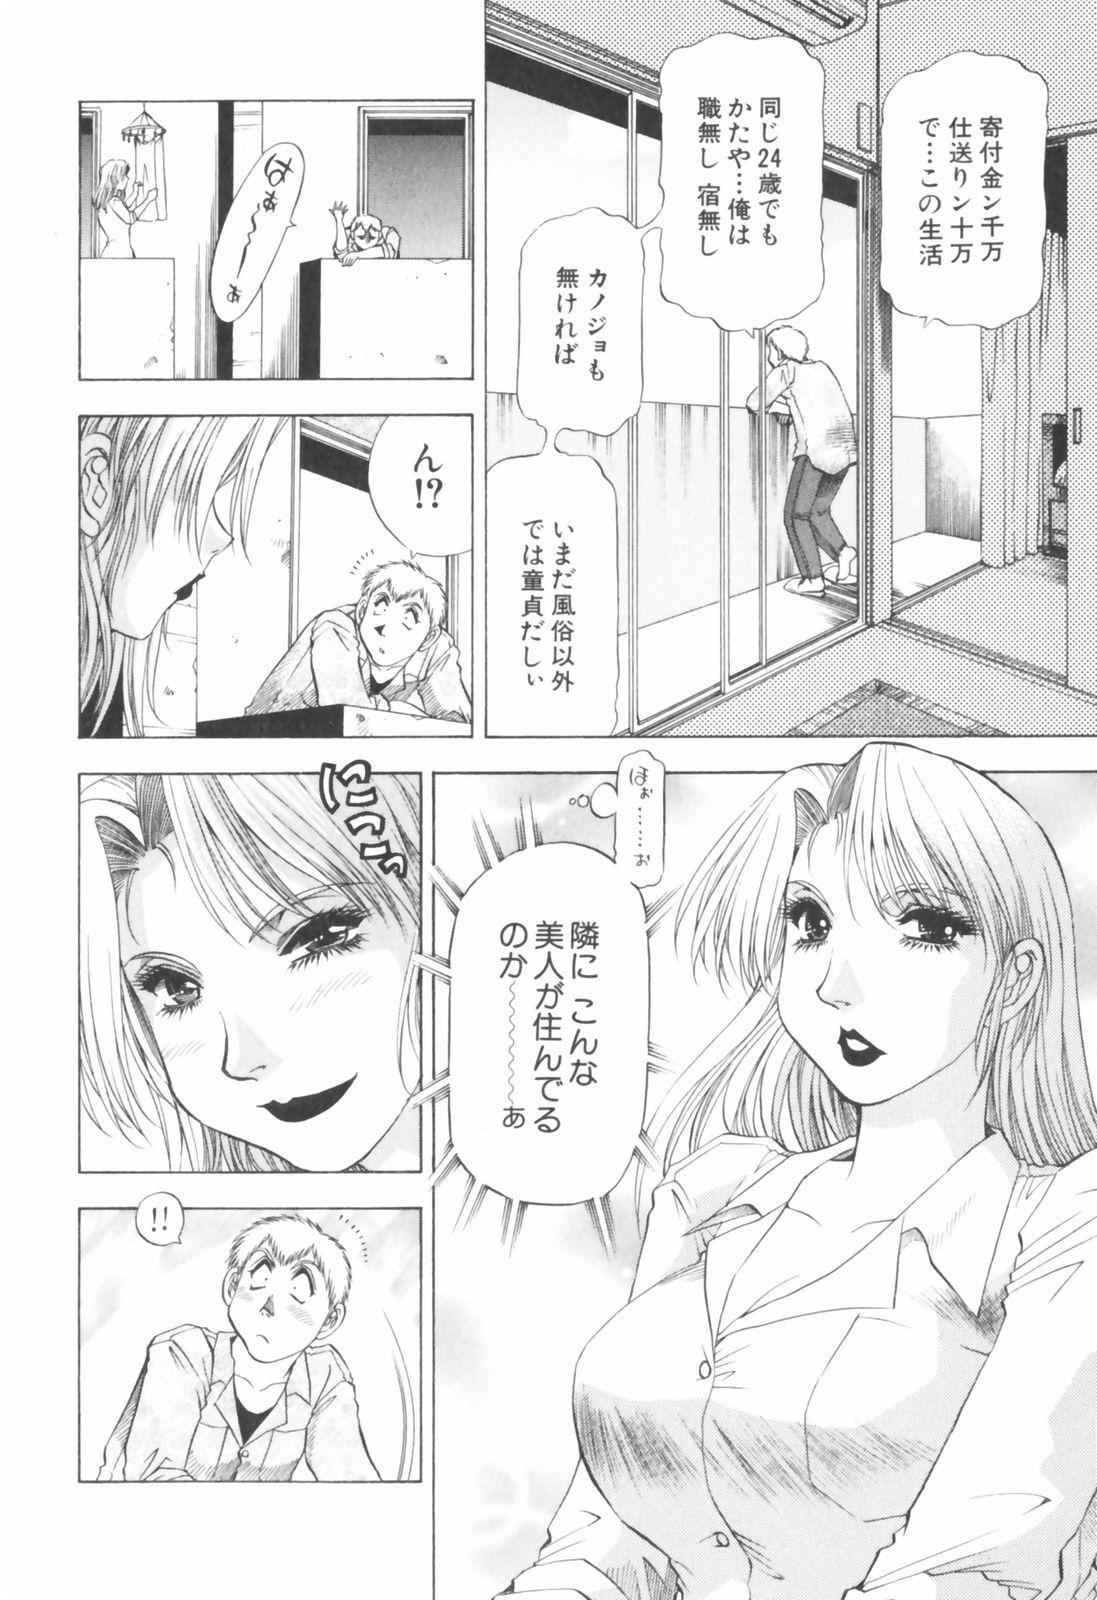 Doukyonin ni Onegai! 7